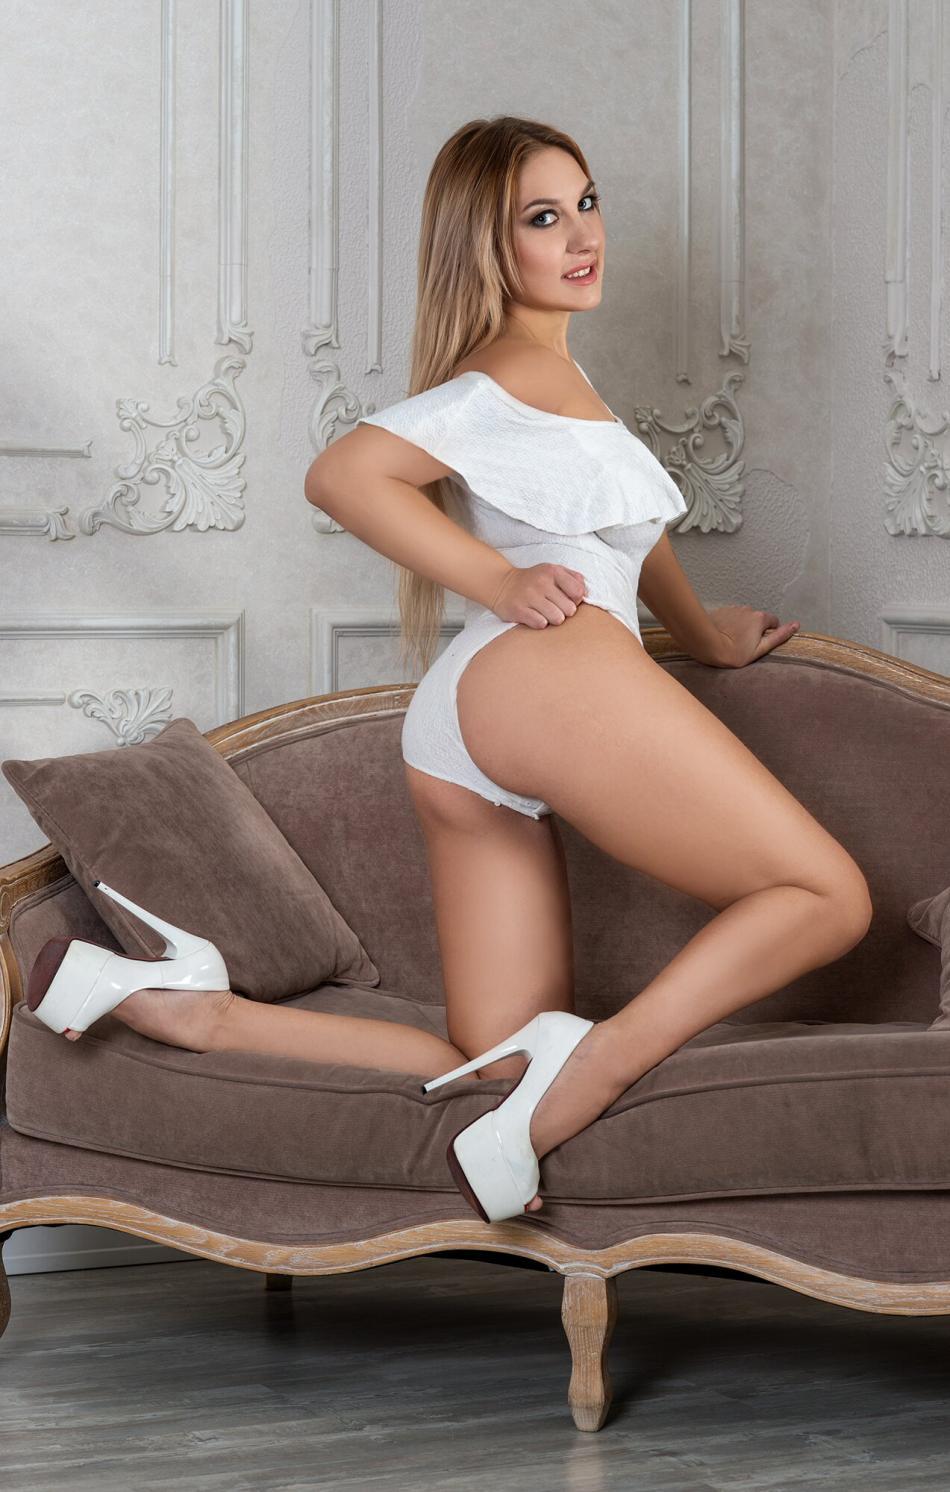 Ladyfordaddy.com Betty Escort Girl In New York 11074647 - 8 8